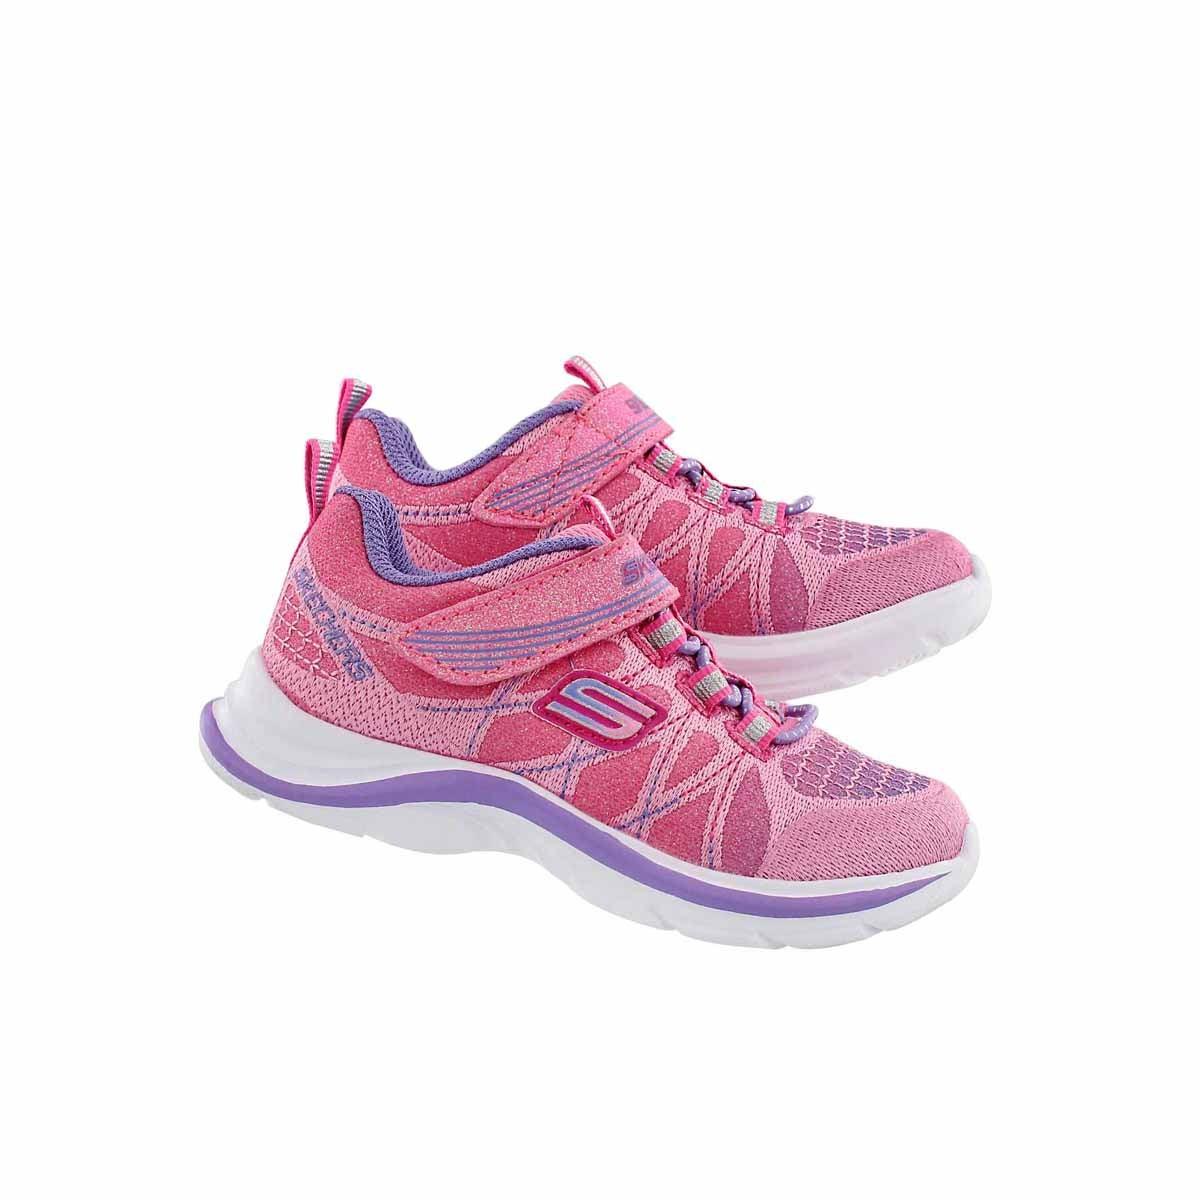 Inf Color Spark pink/lav running shoe